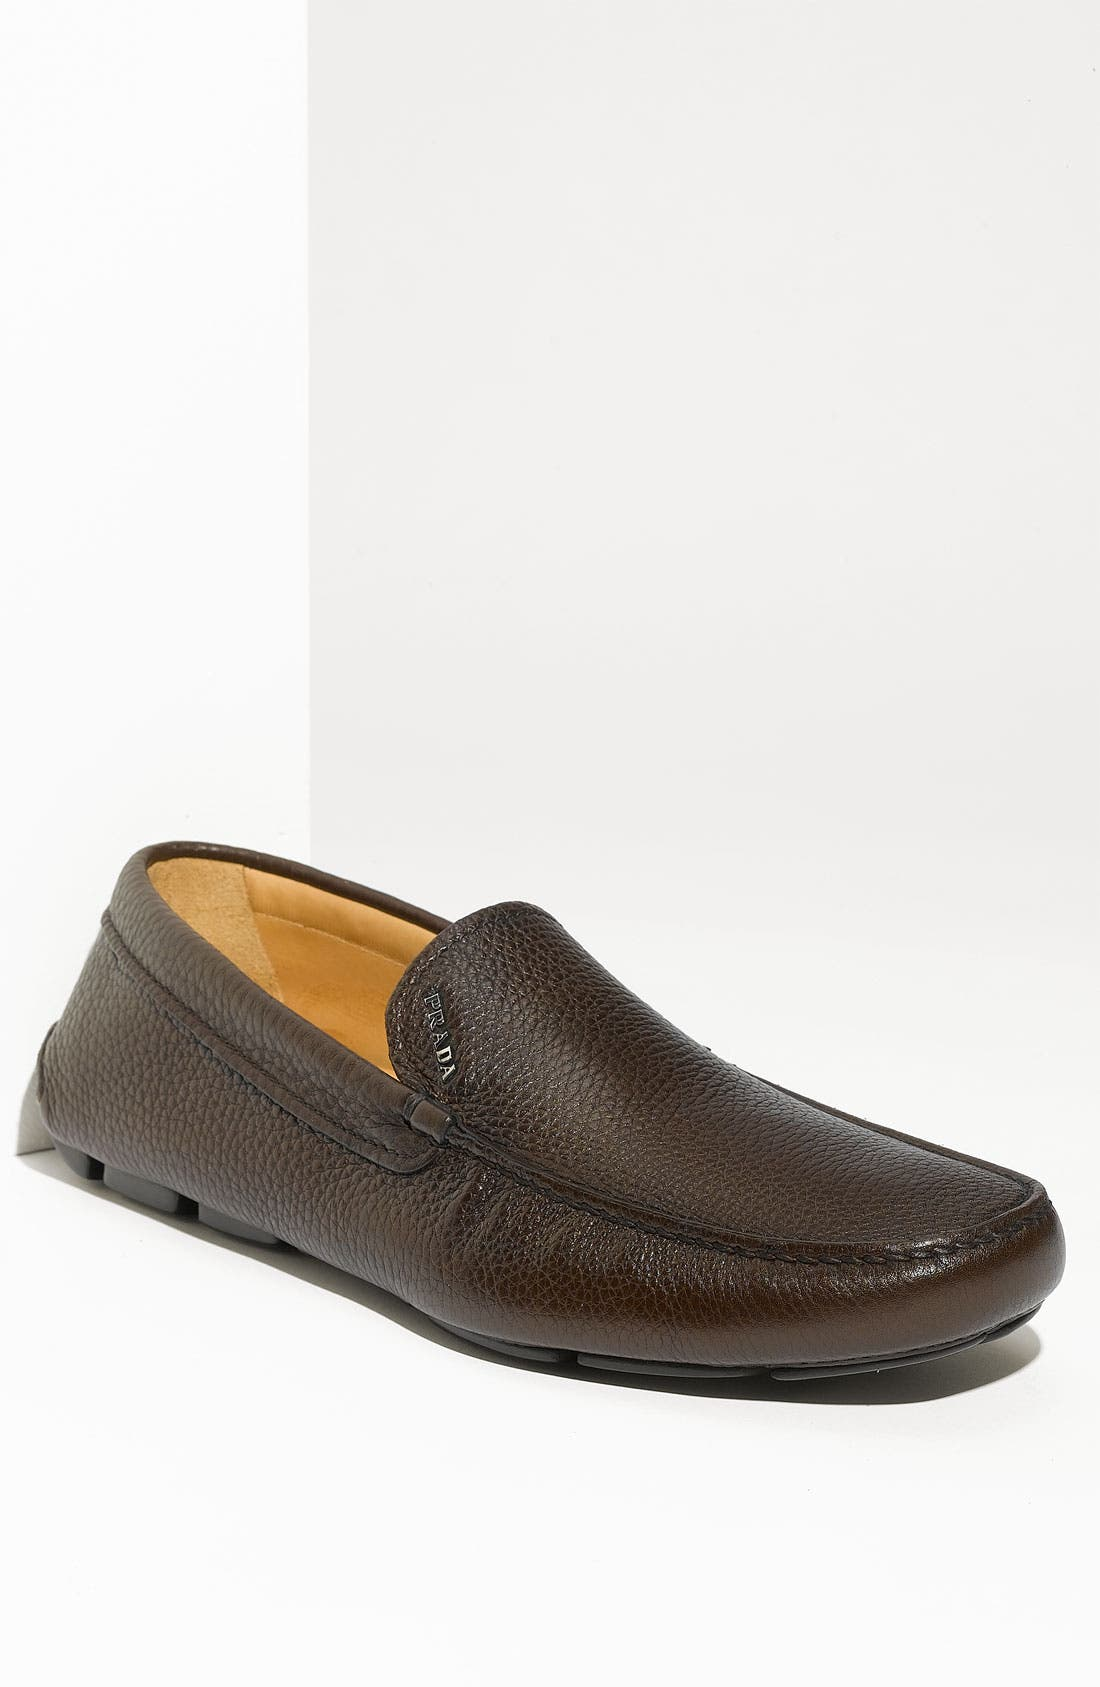 Main Image - Prada Pebbled Leather Driving Shoe (Men)